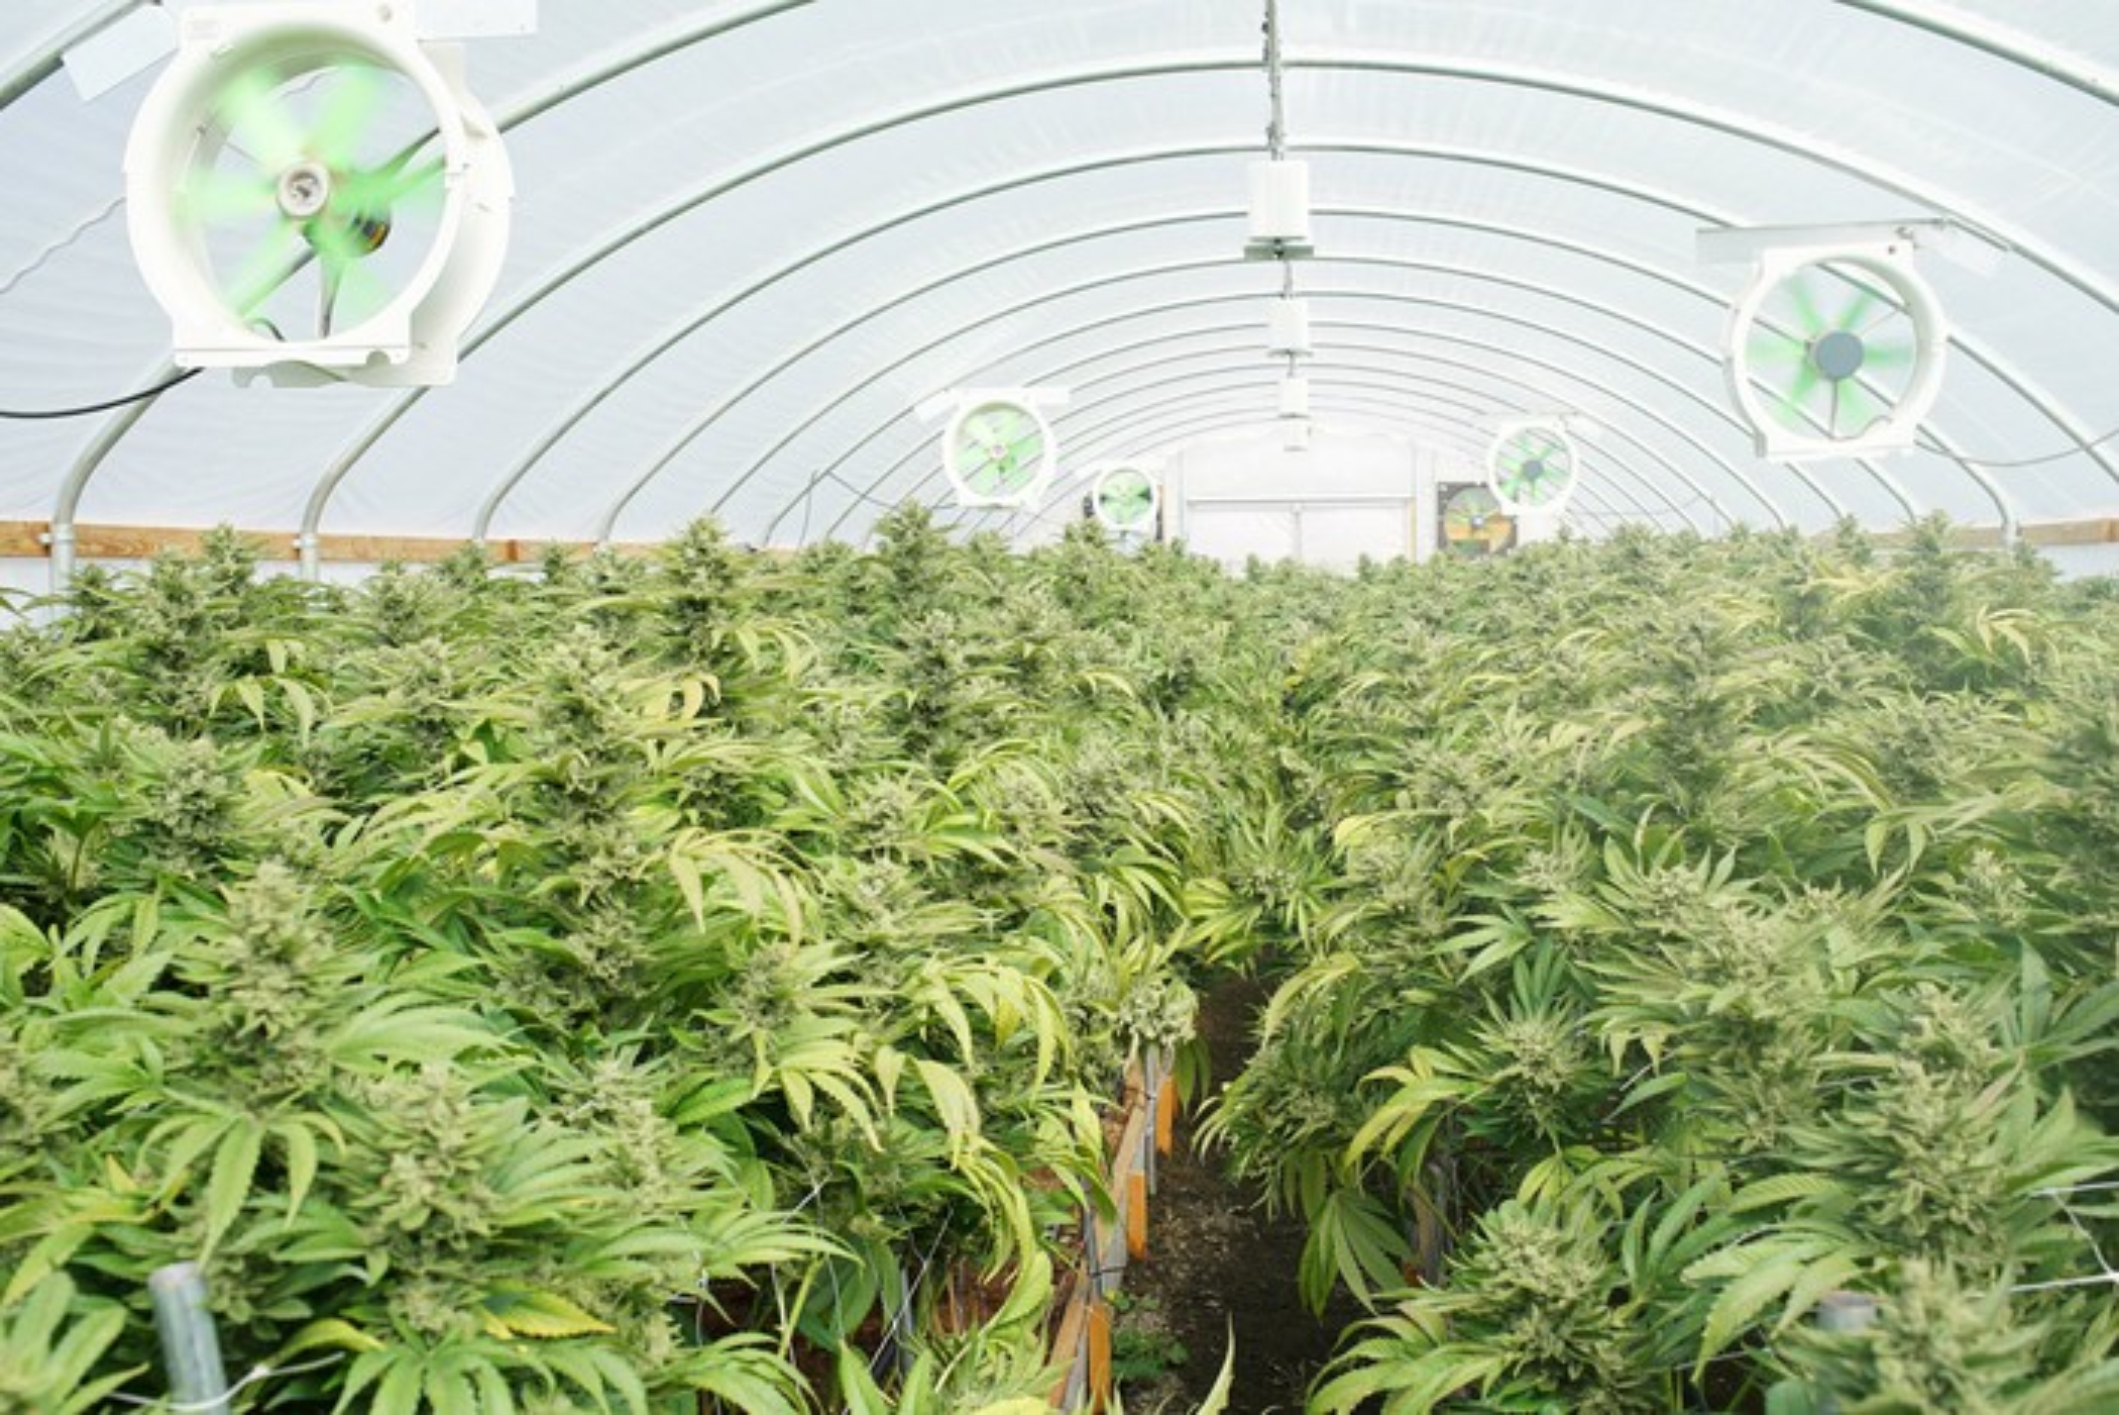 A commercial indoor marijuana grow farm.